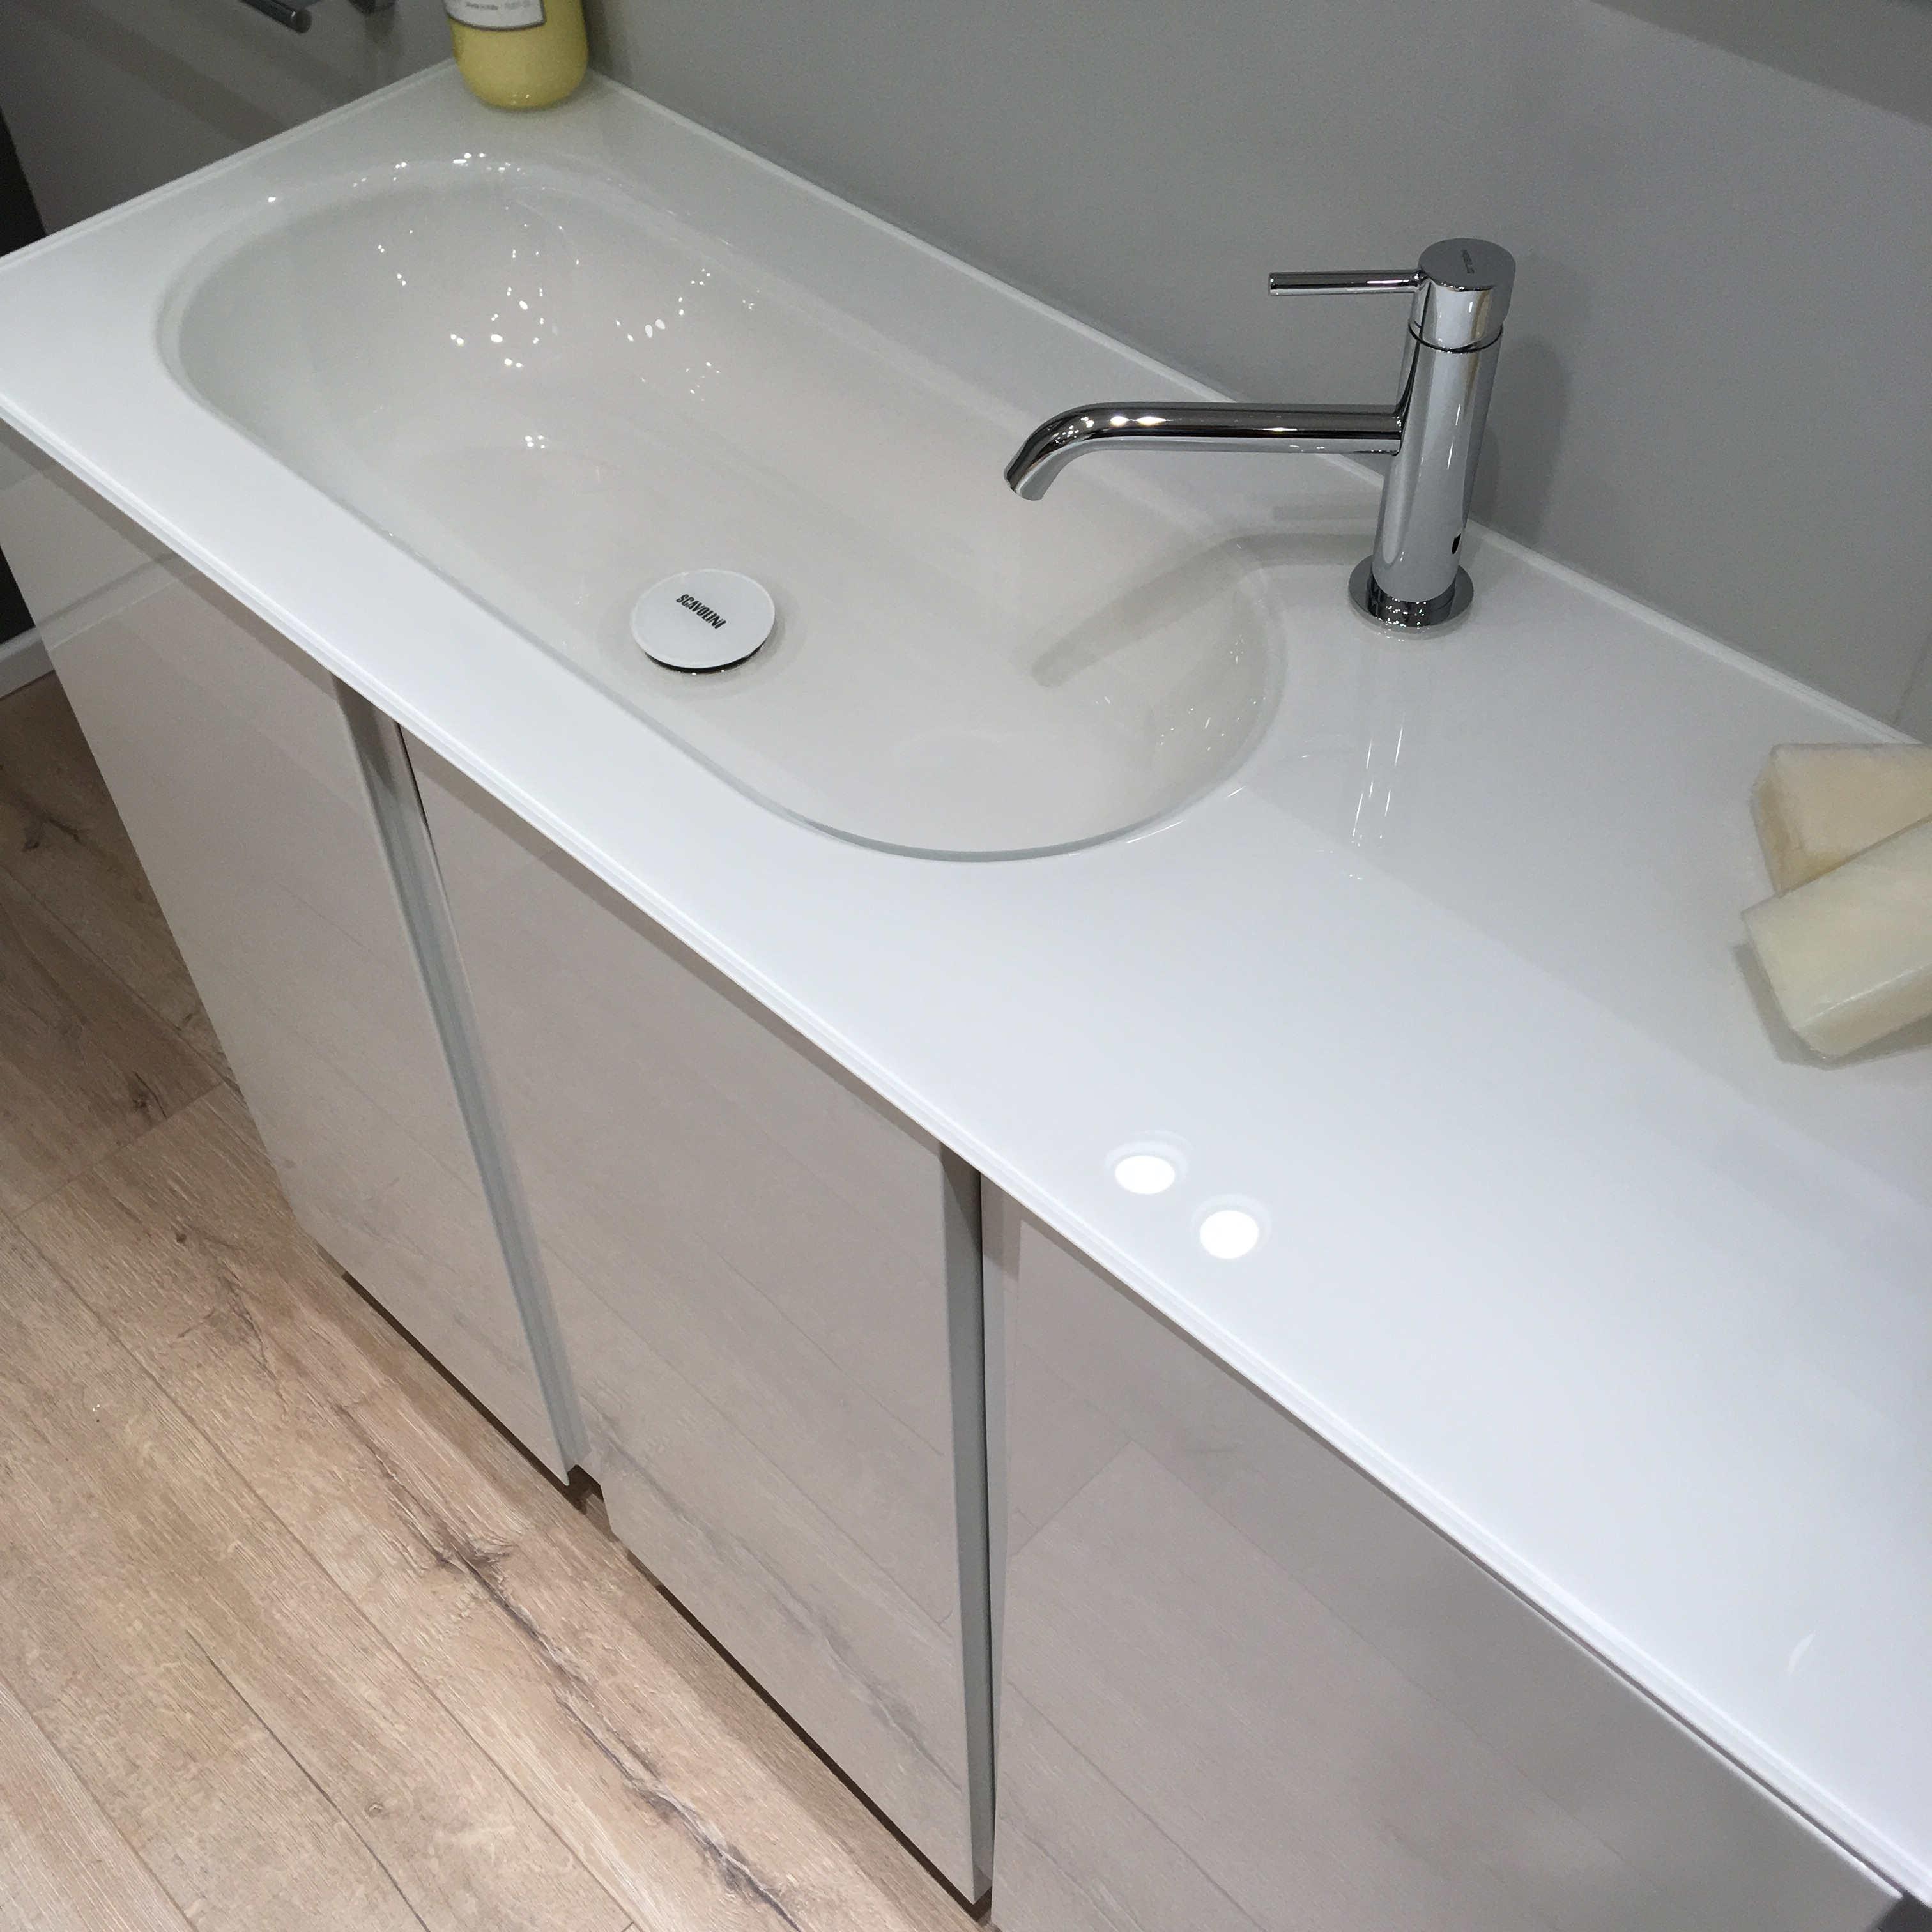 Scavolini bathrooms arredo bagno scavolini mod lagu - Arredo bagno scavolini ...